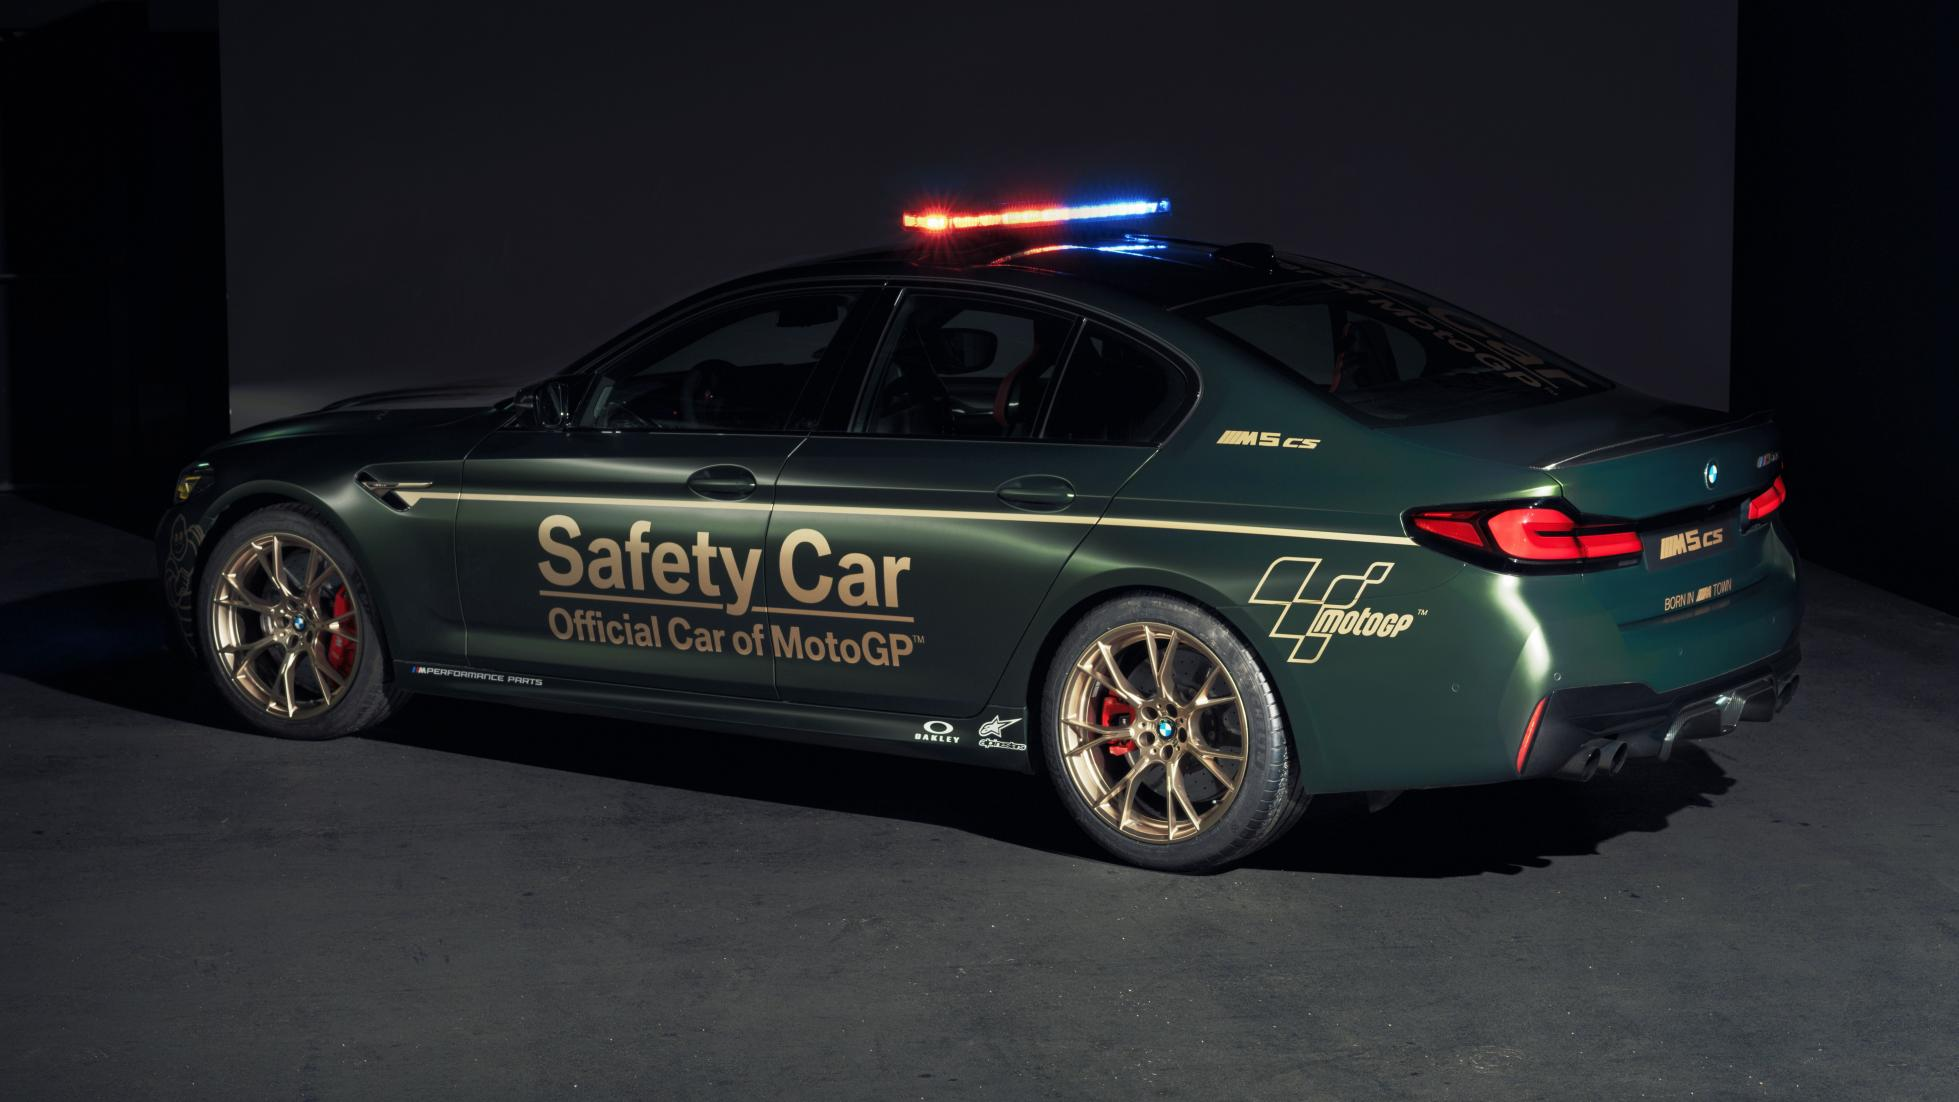 The BMW M5 as a MotoGP safety car, rear alternative angle